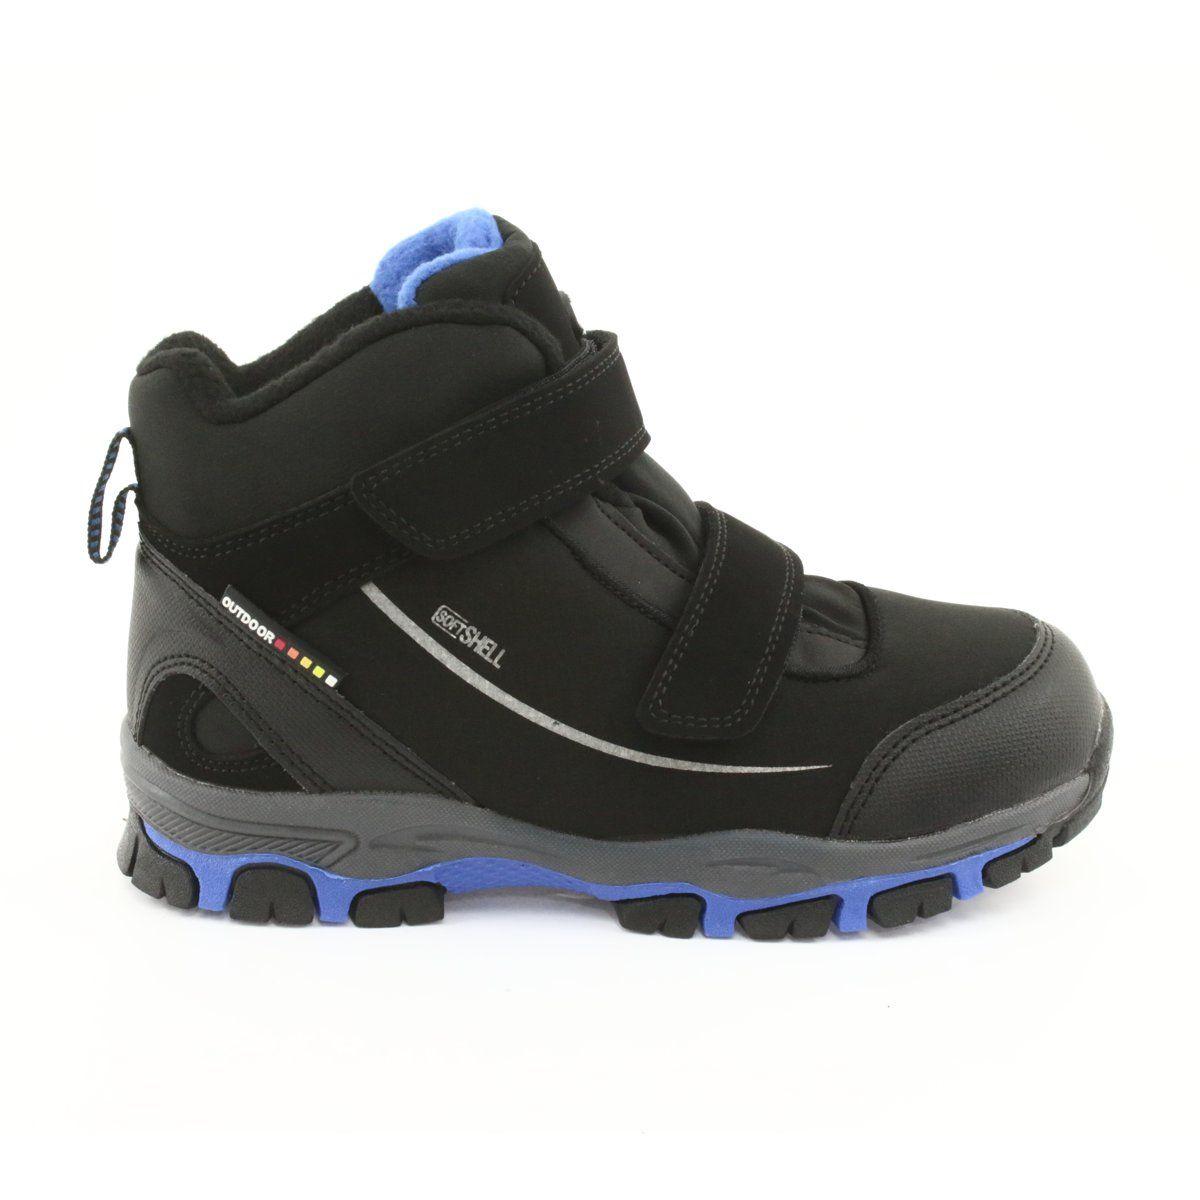 American Club Trzewiki Softshell Z Membrana American Wt64 Czarne Niebieskie Boots Childrens Boots Kid Shoes